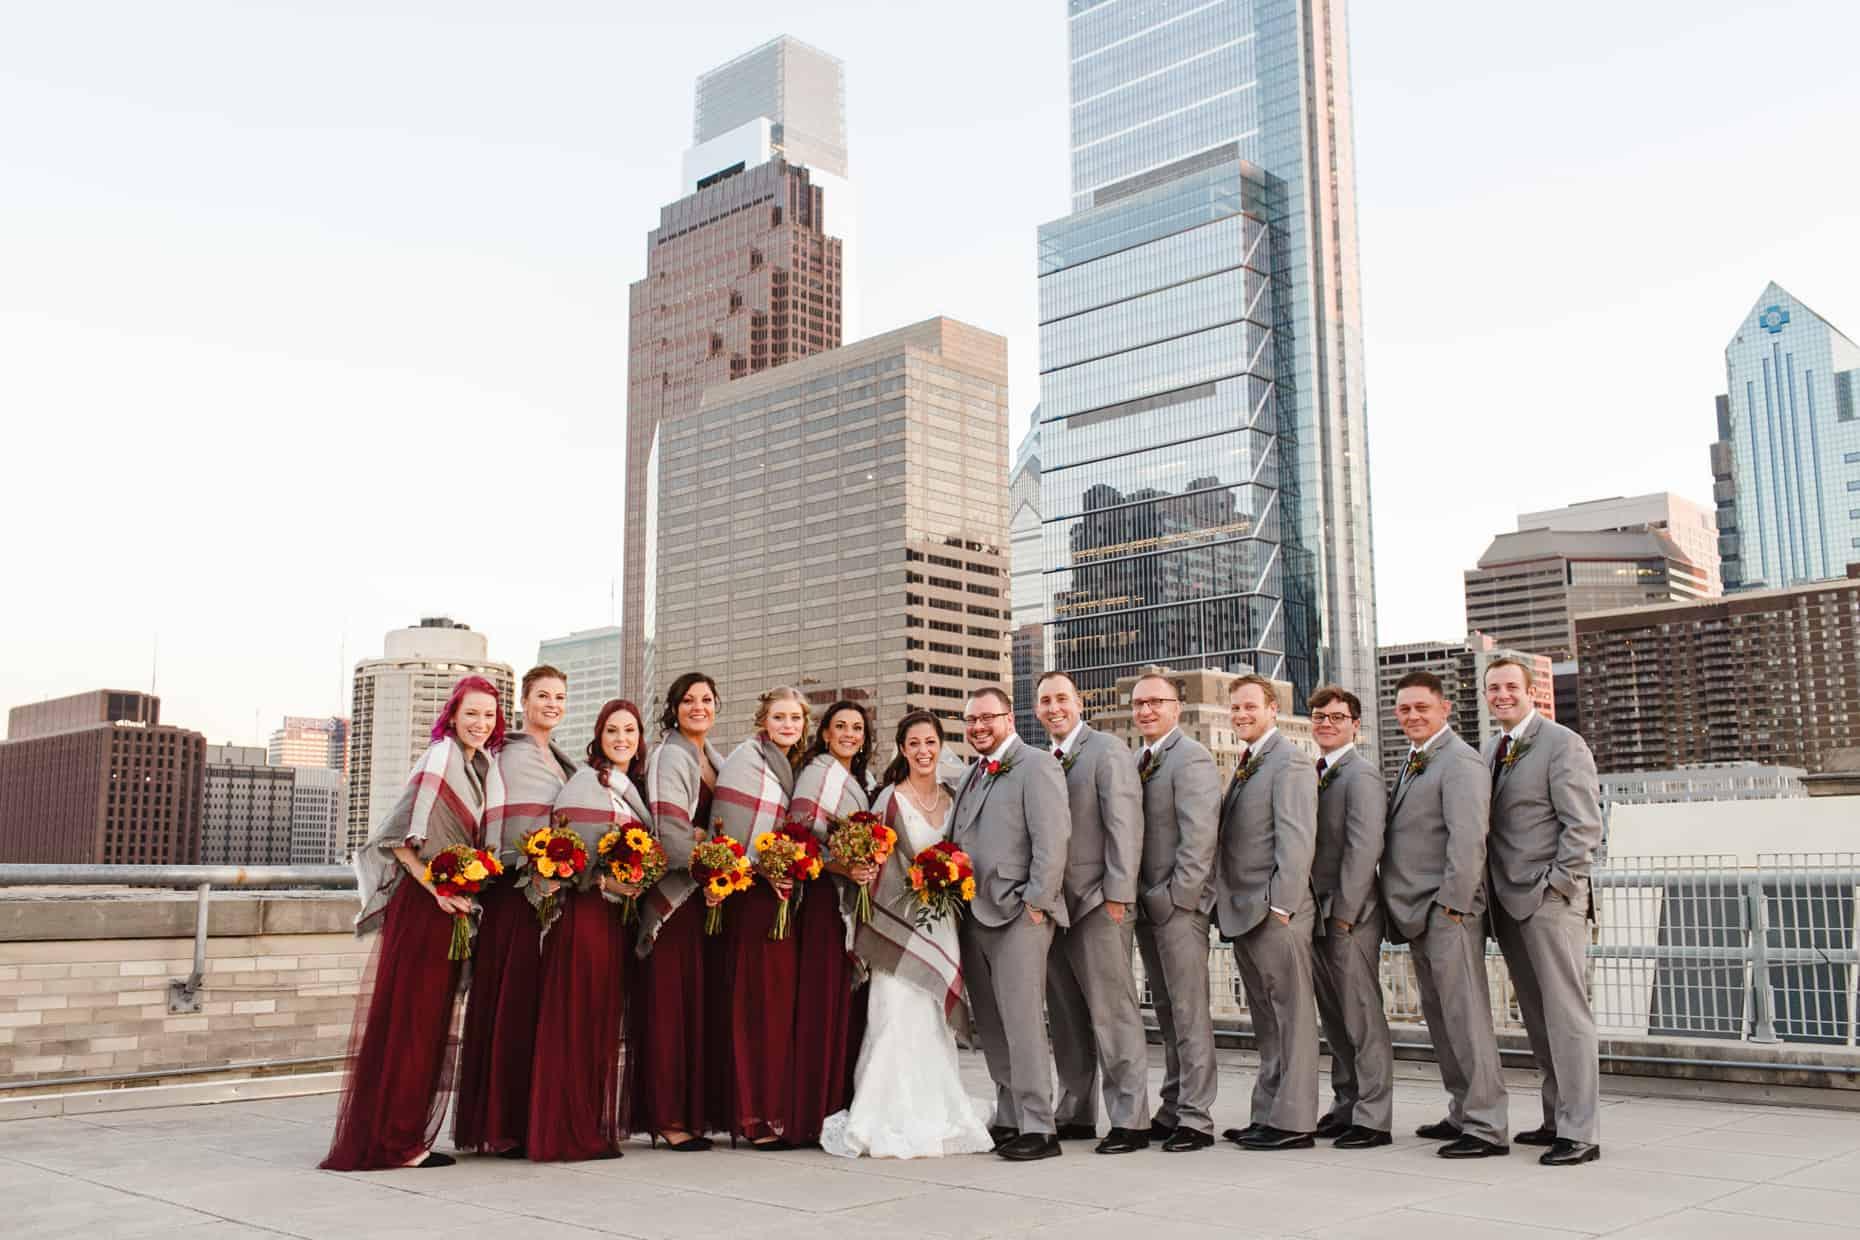 Franklin Institute rooftop Wedding